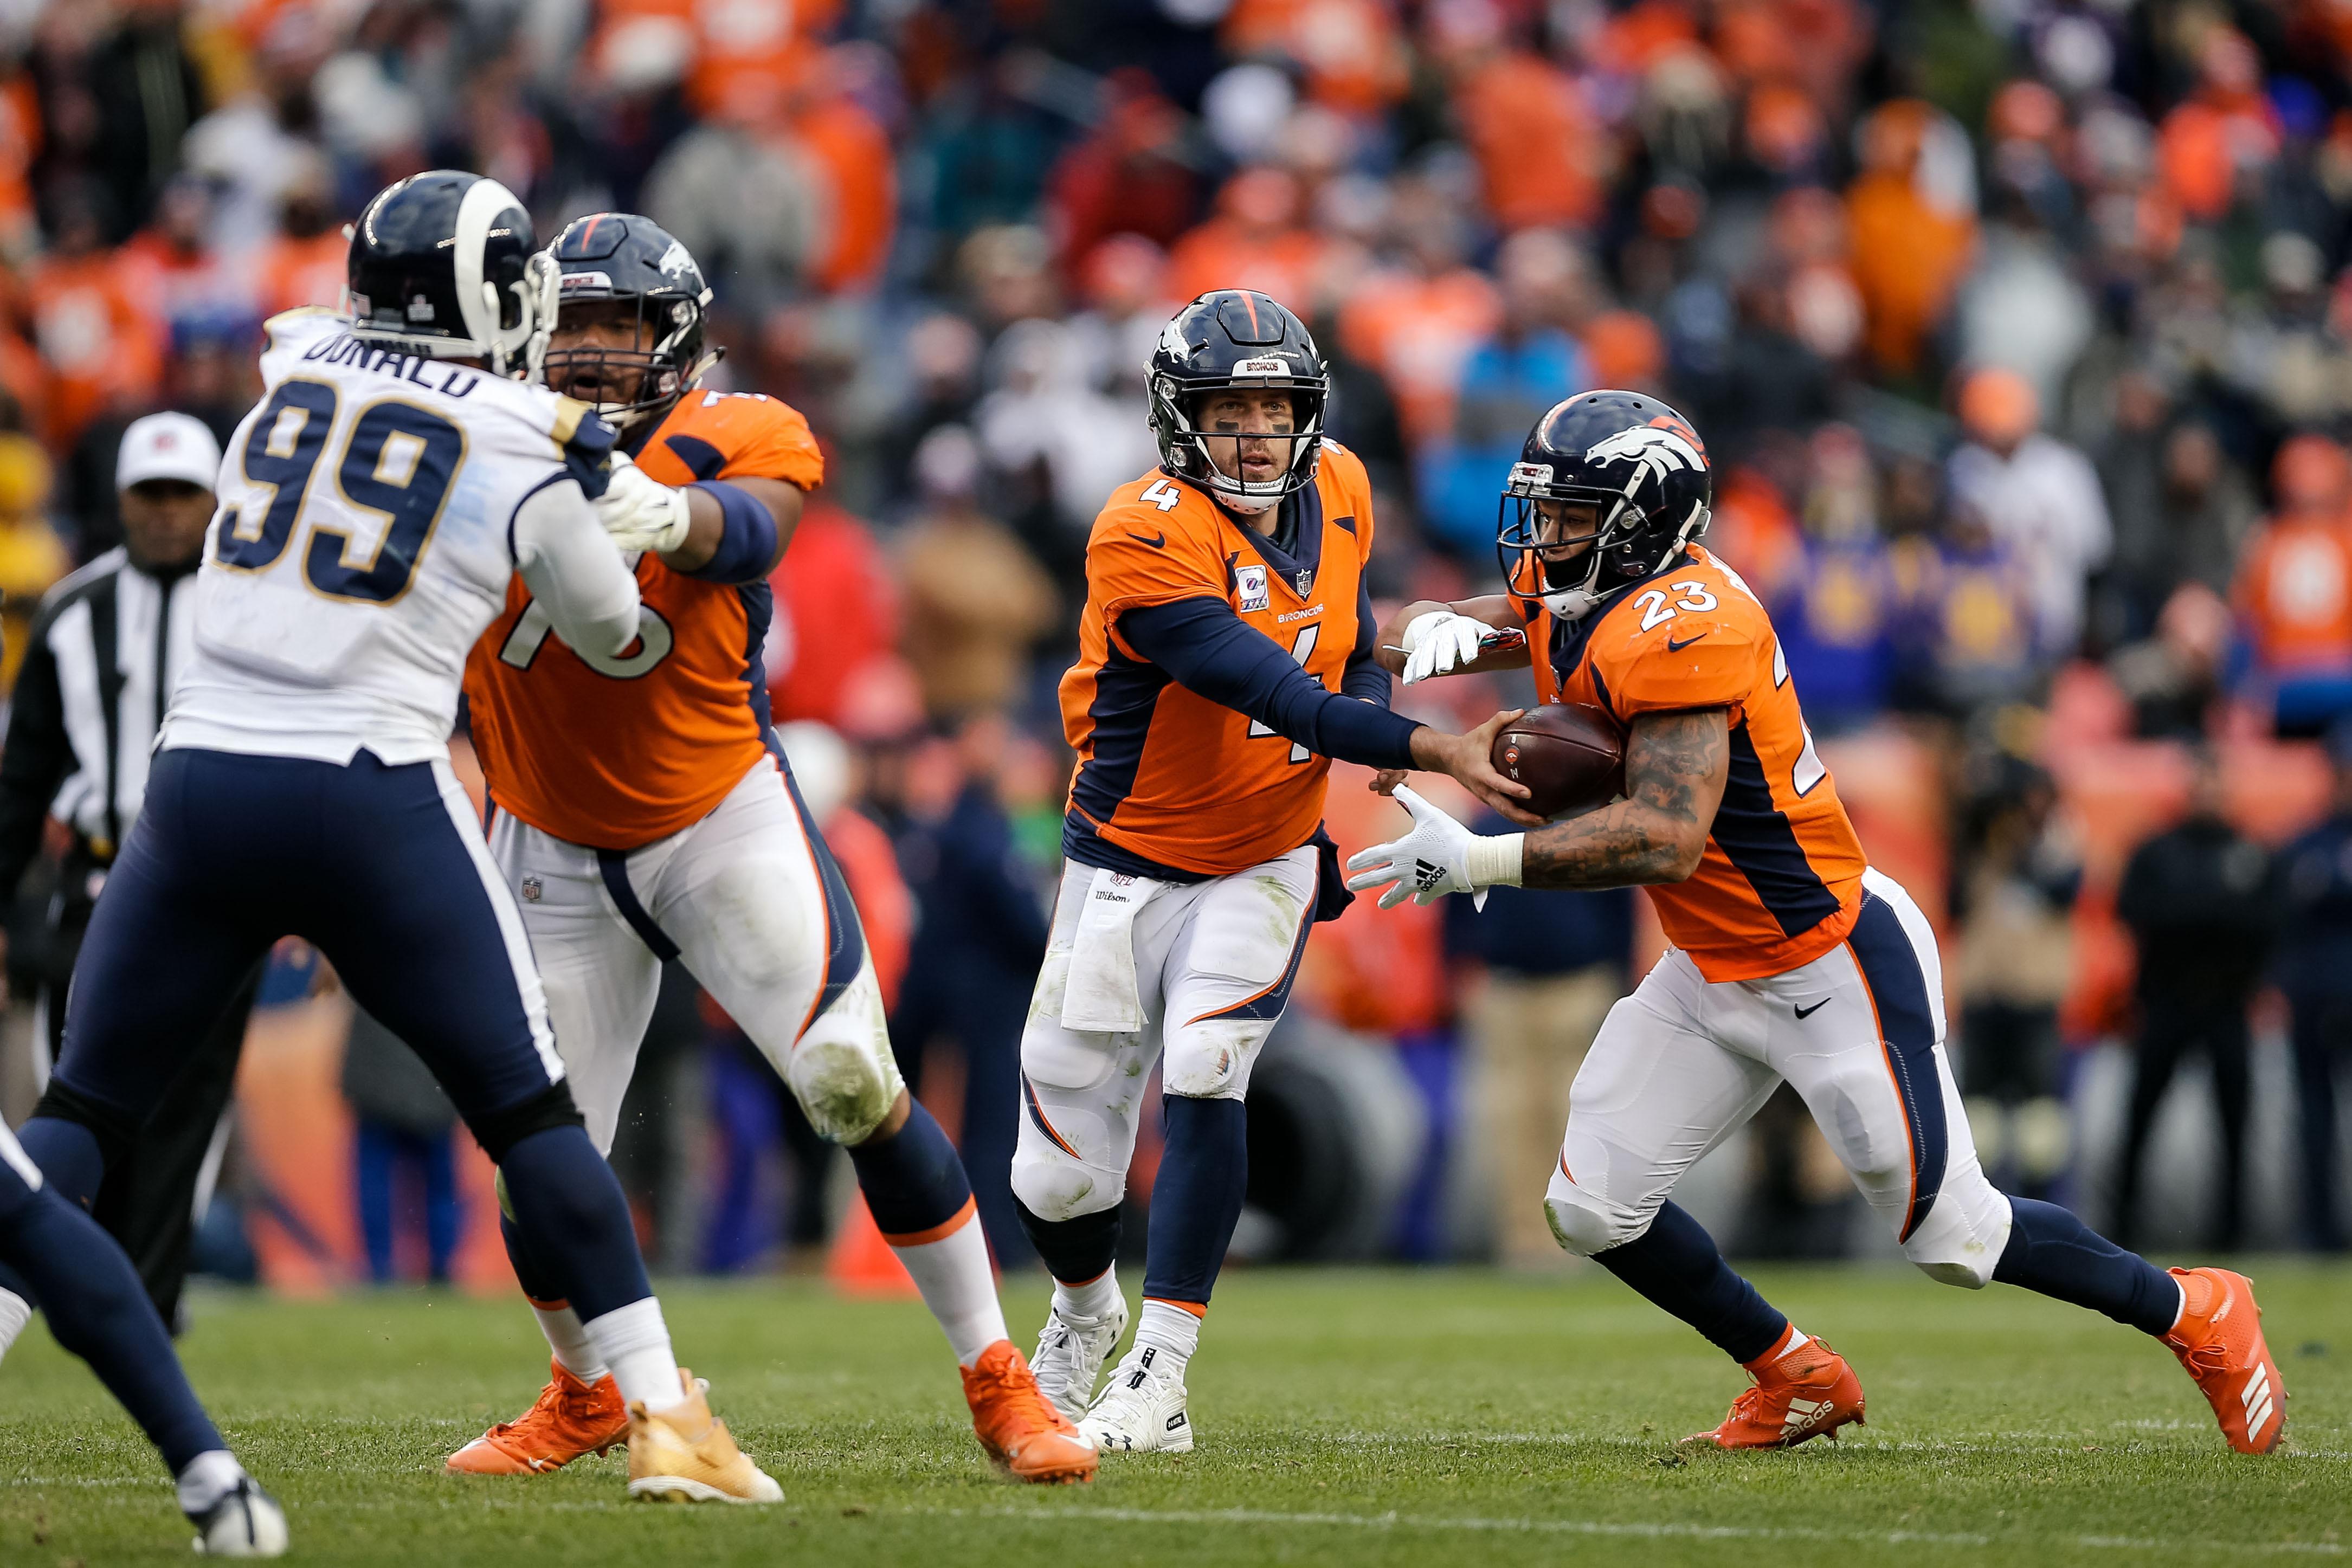 Oct   Denver Co Usa Denver Broncos Quarterback Case Keenum  Hands The Ball Off To Running Back Devontae Booker  As Guard Max Garcia